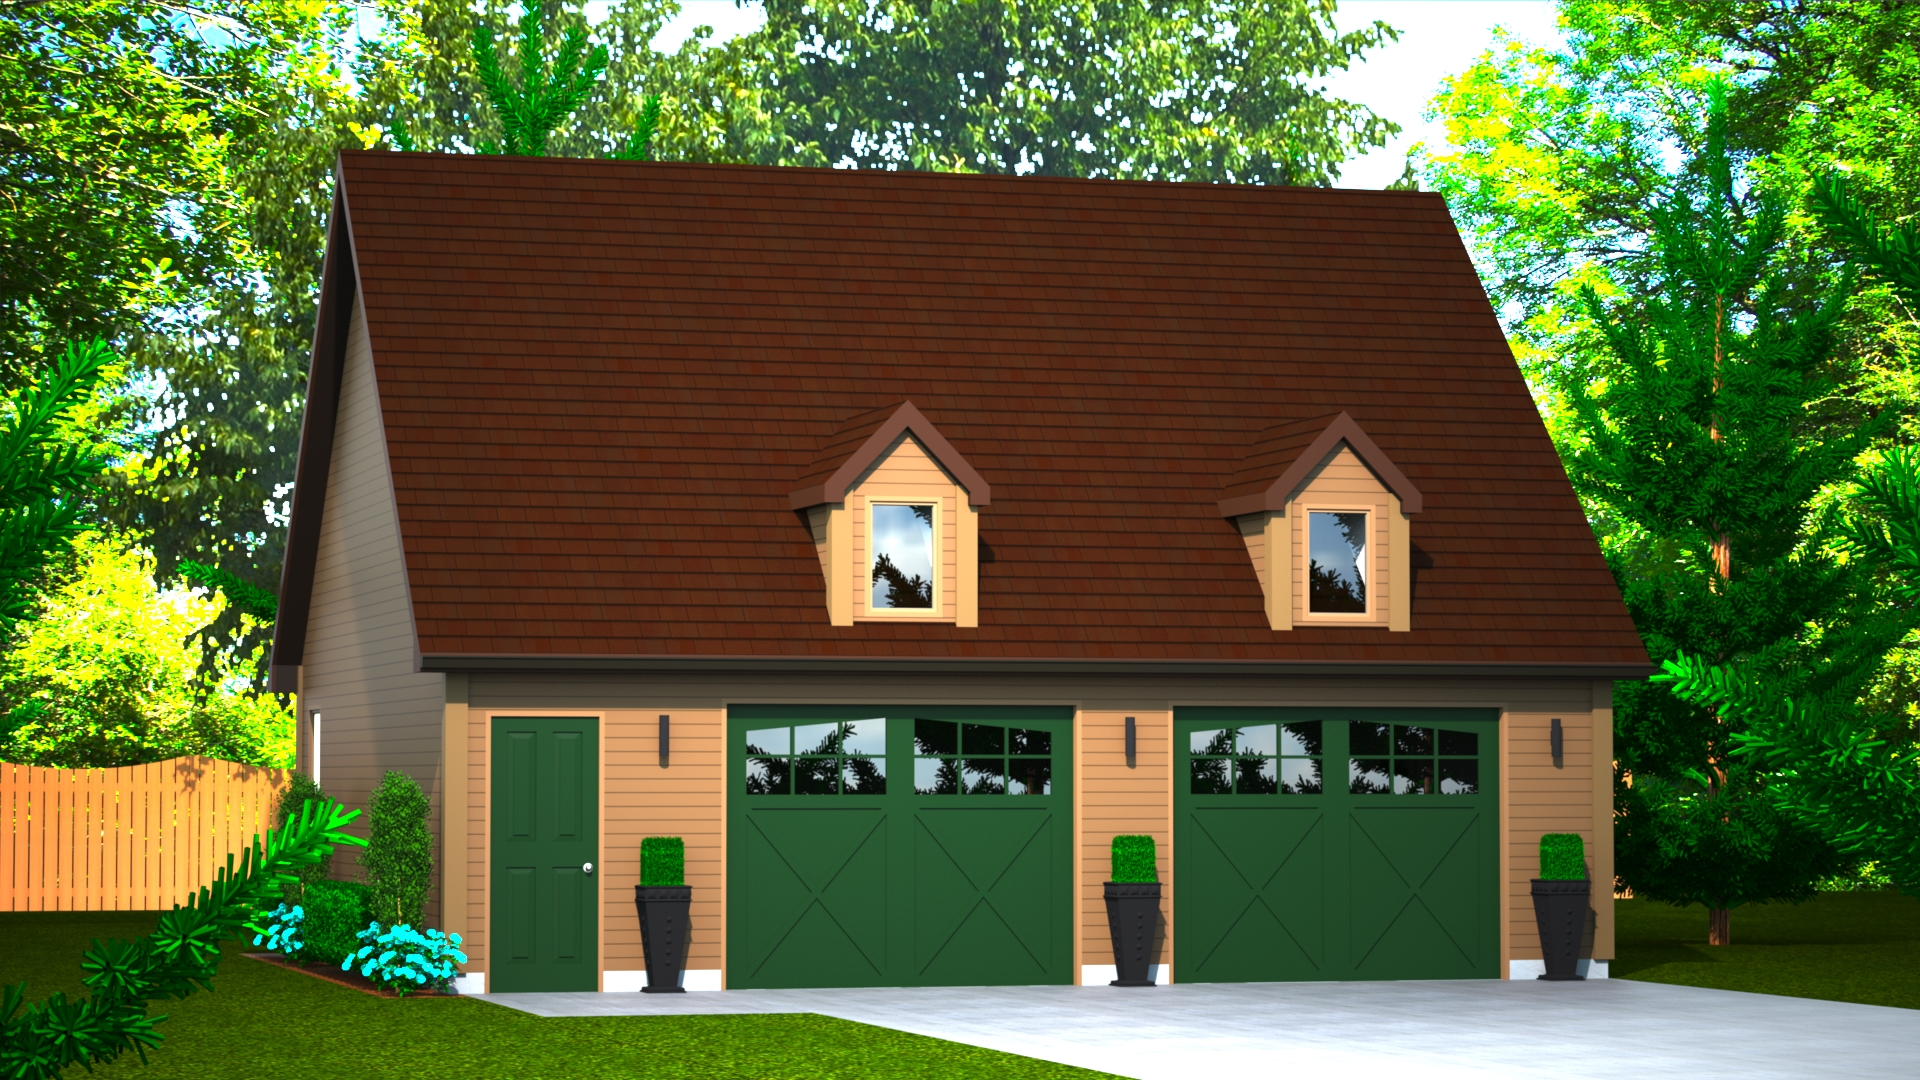 725 sq.ft. timber mart 2 car garage exterior render